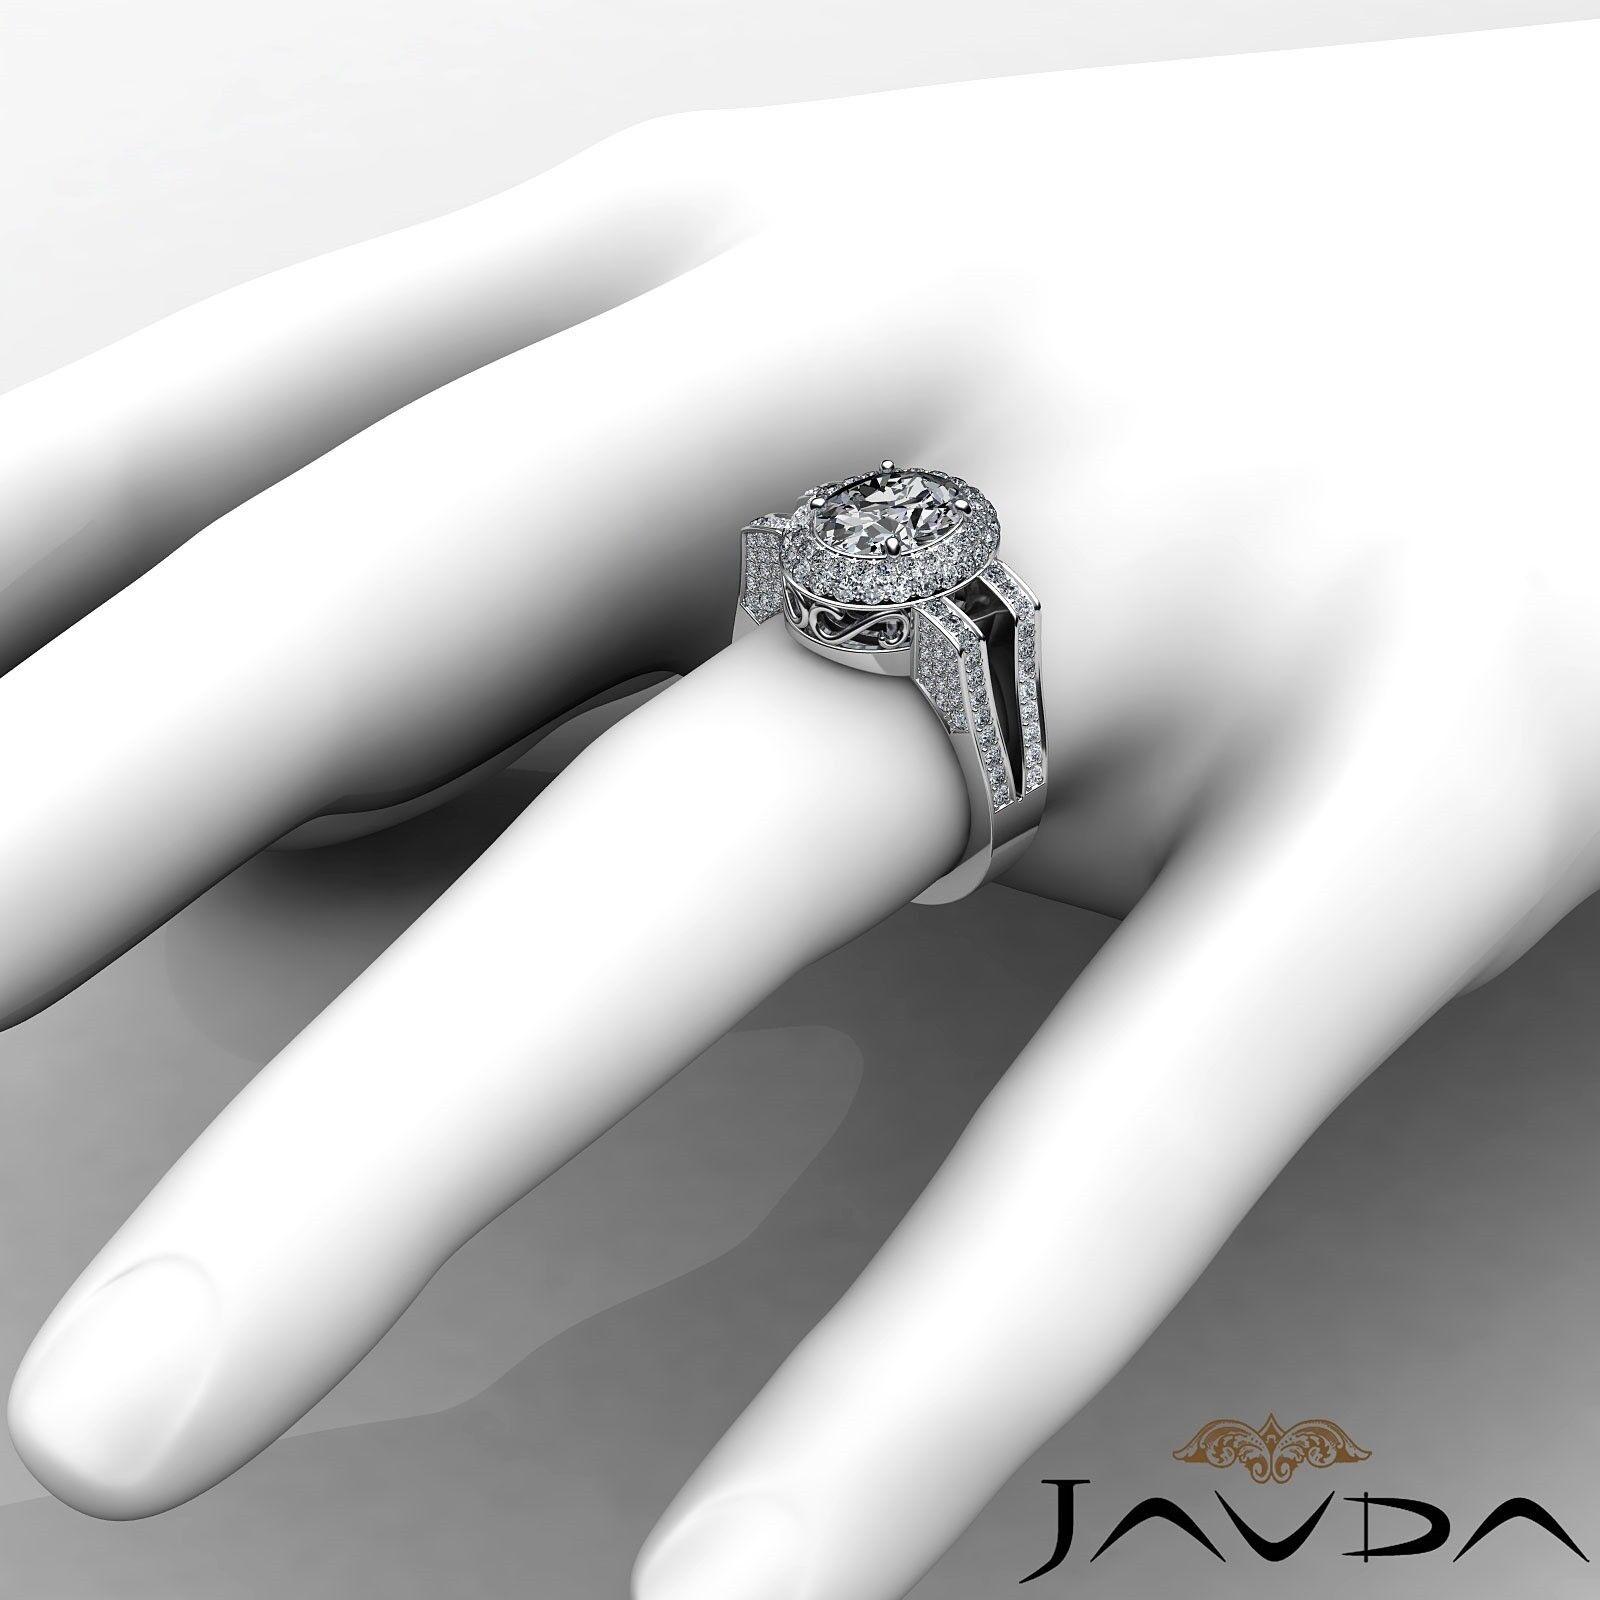 1.9ctw Gala Halo Split Shank Oval Diamond Engagement Ring GIA E-VS2 White Gold 3